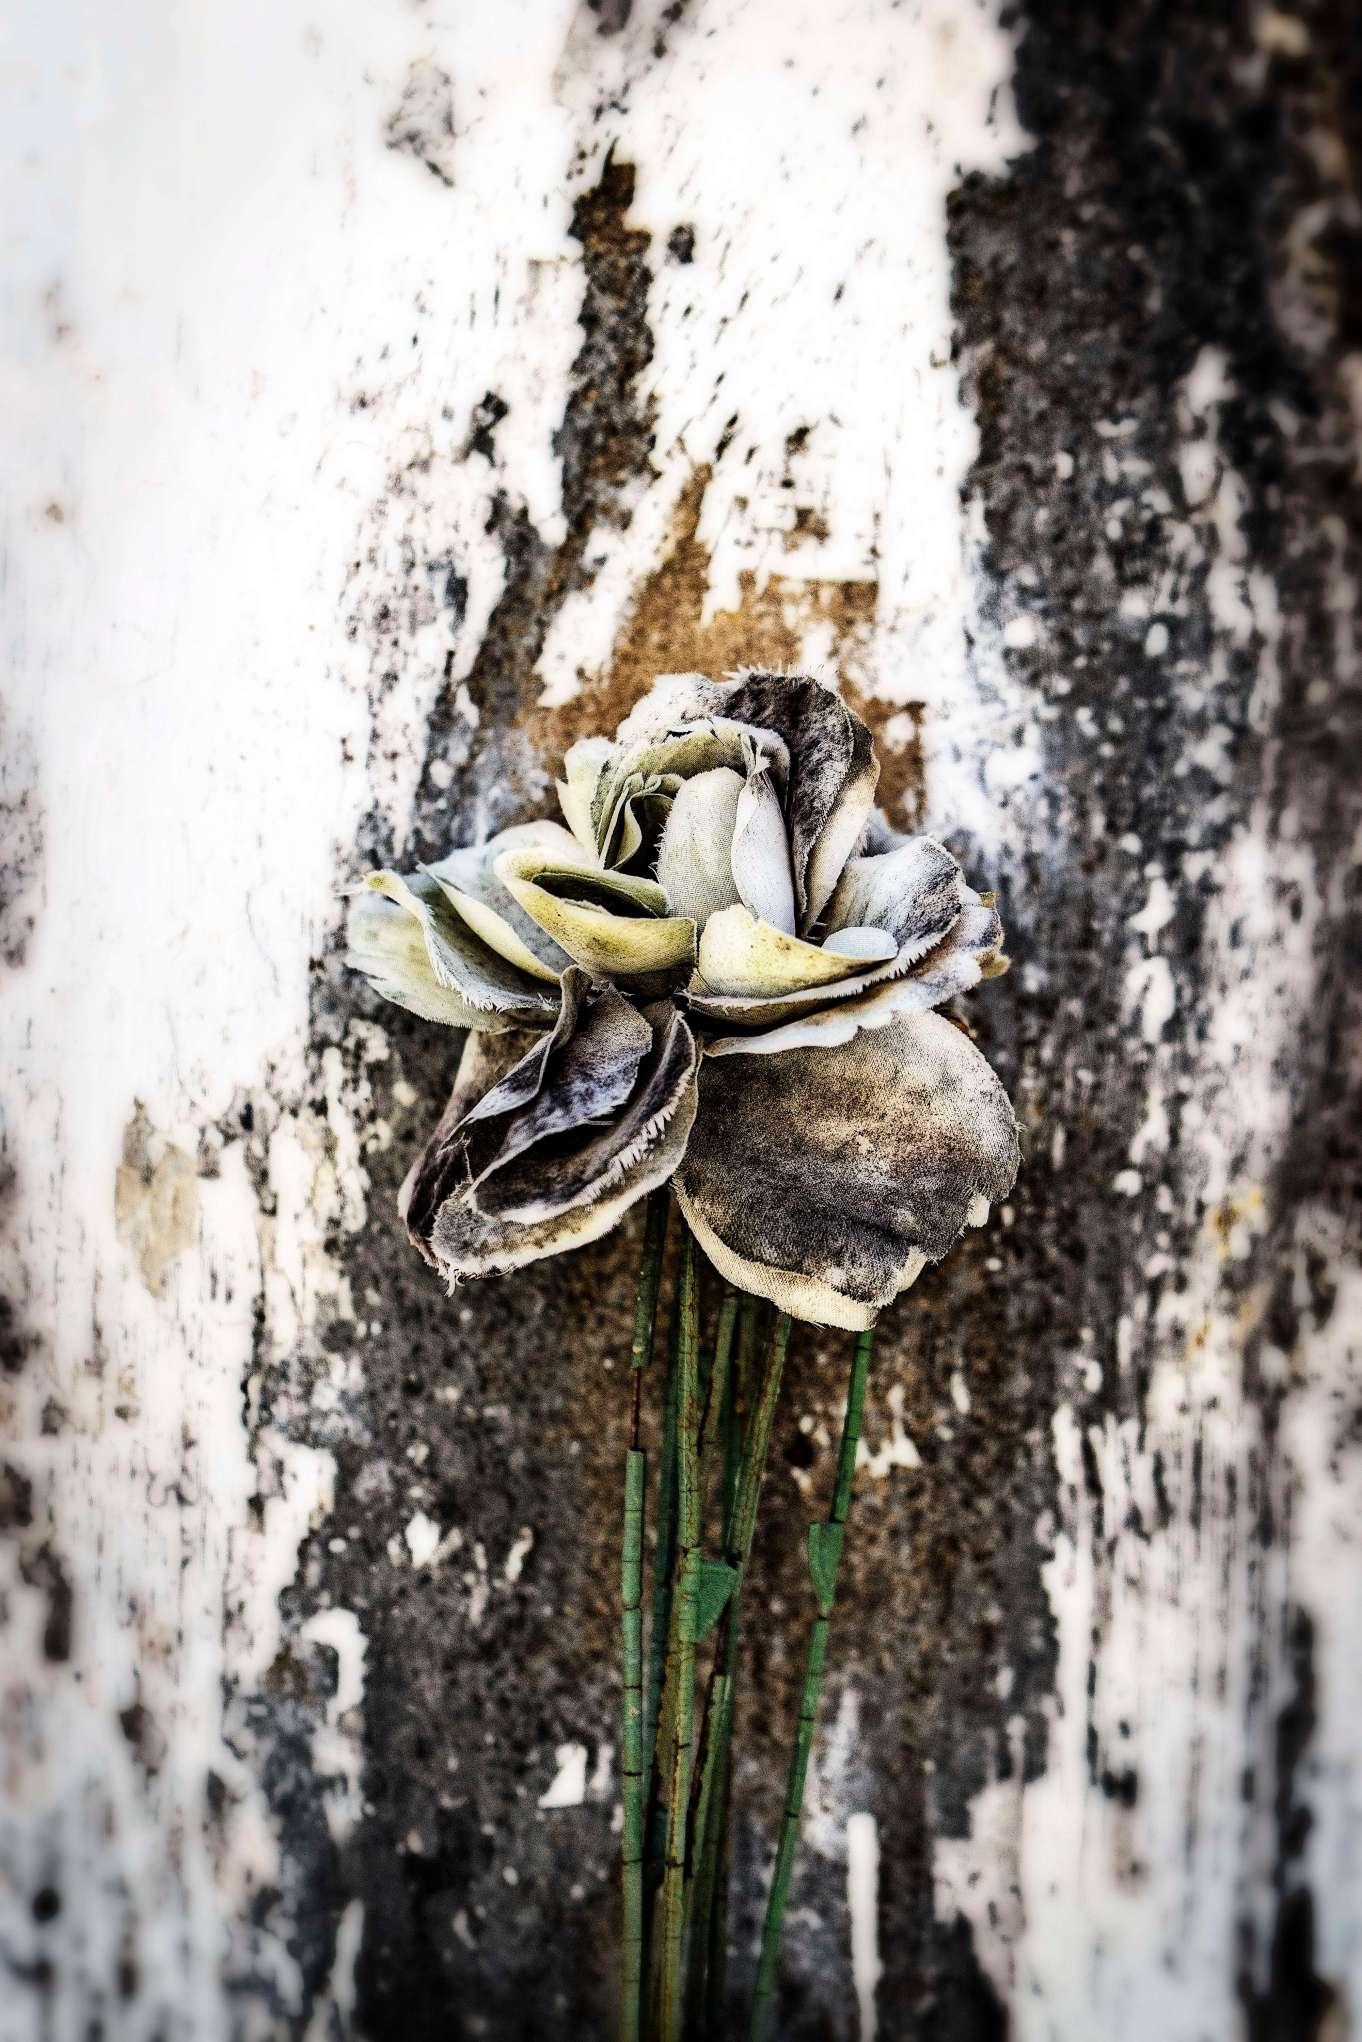 Worn flowers.